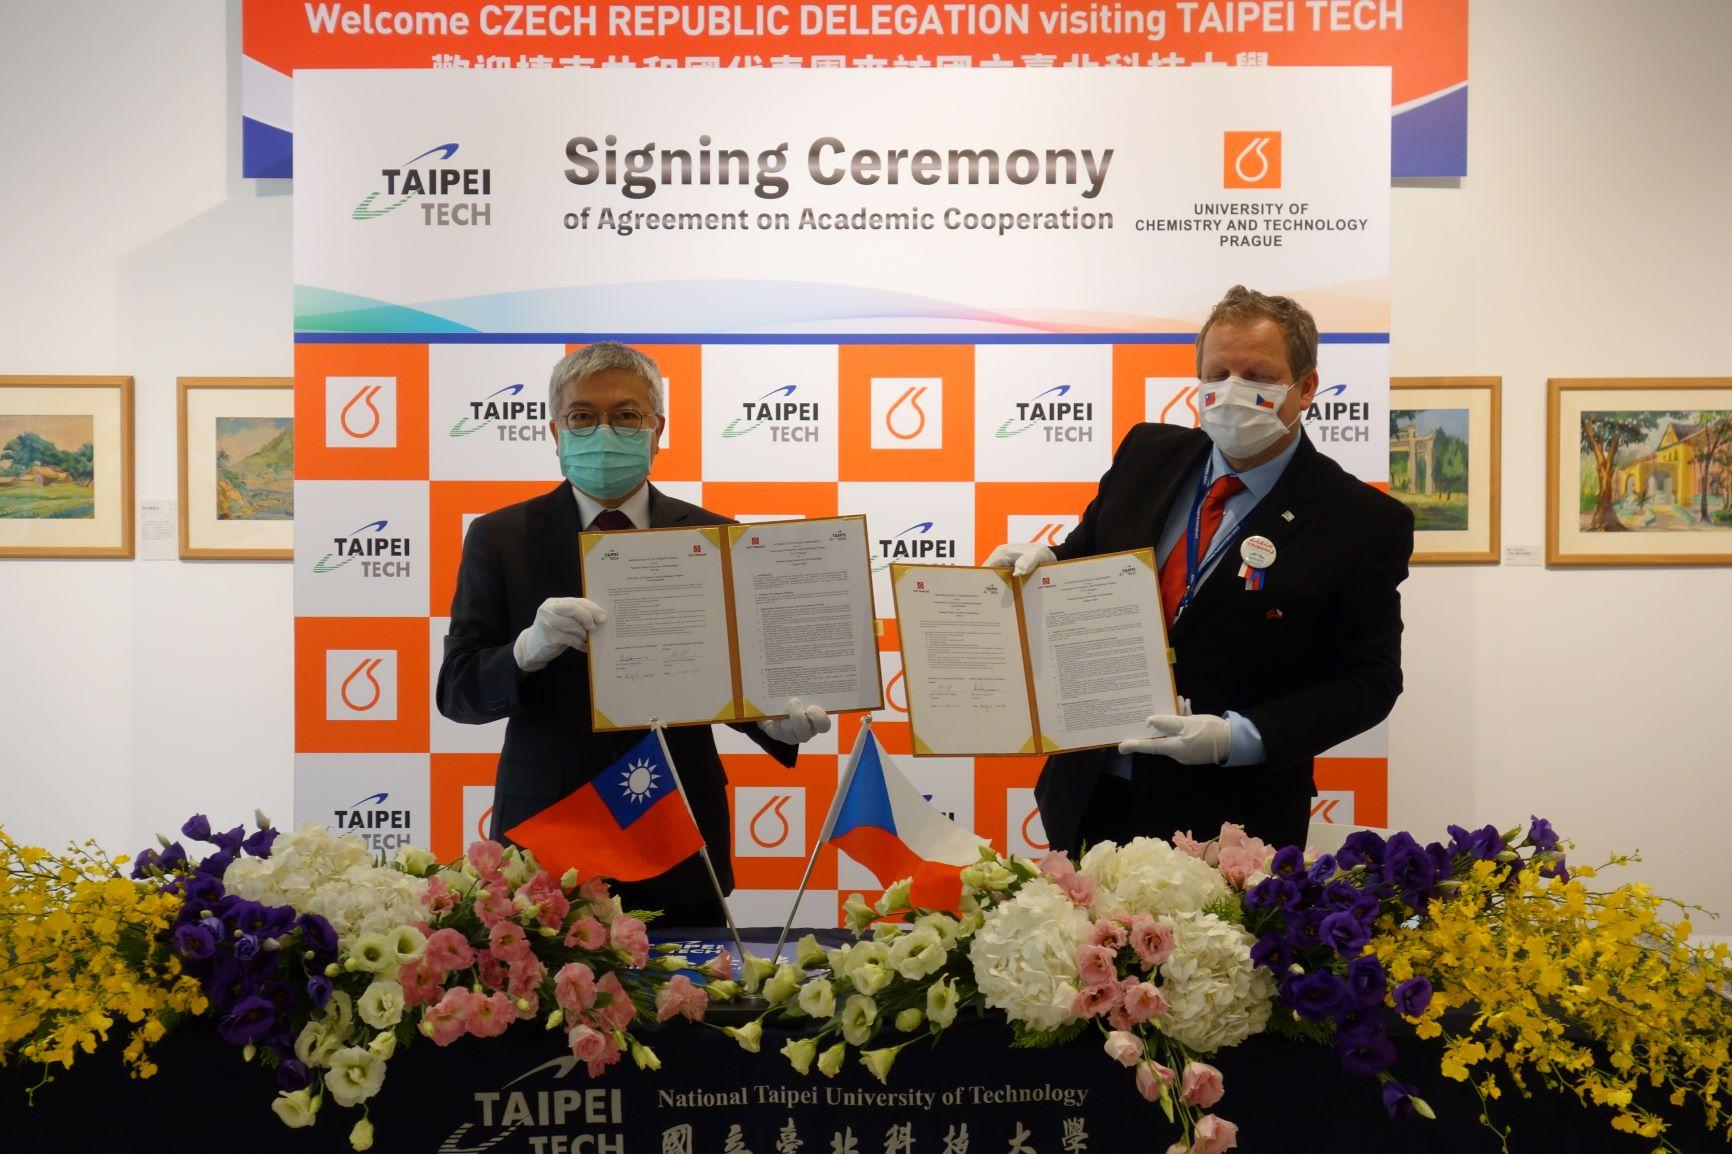 Podpis memoranda o spolupráci VSCHT NTUT 2